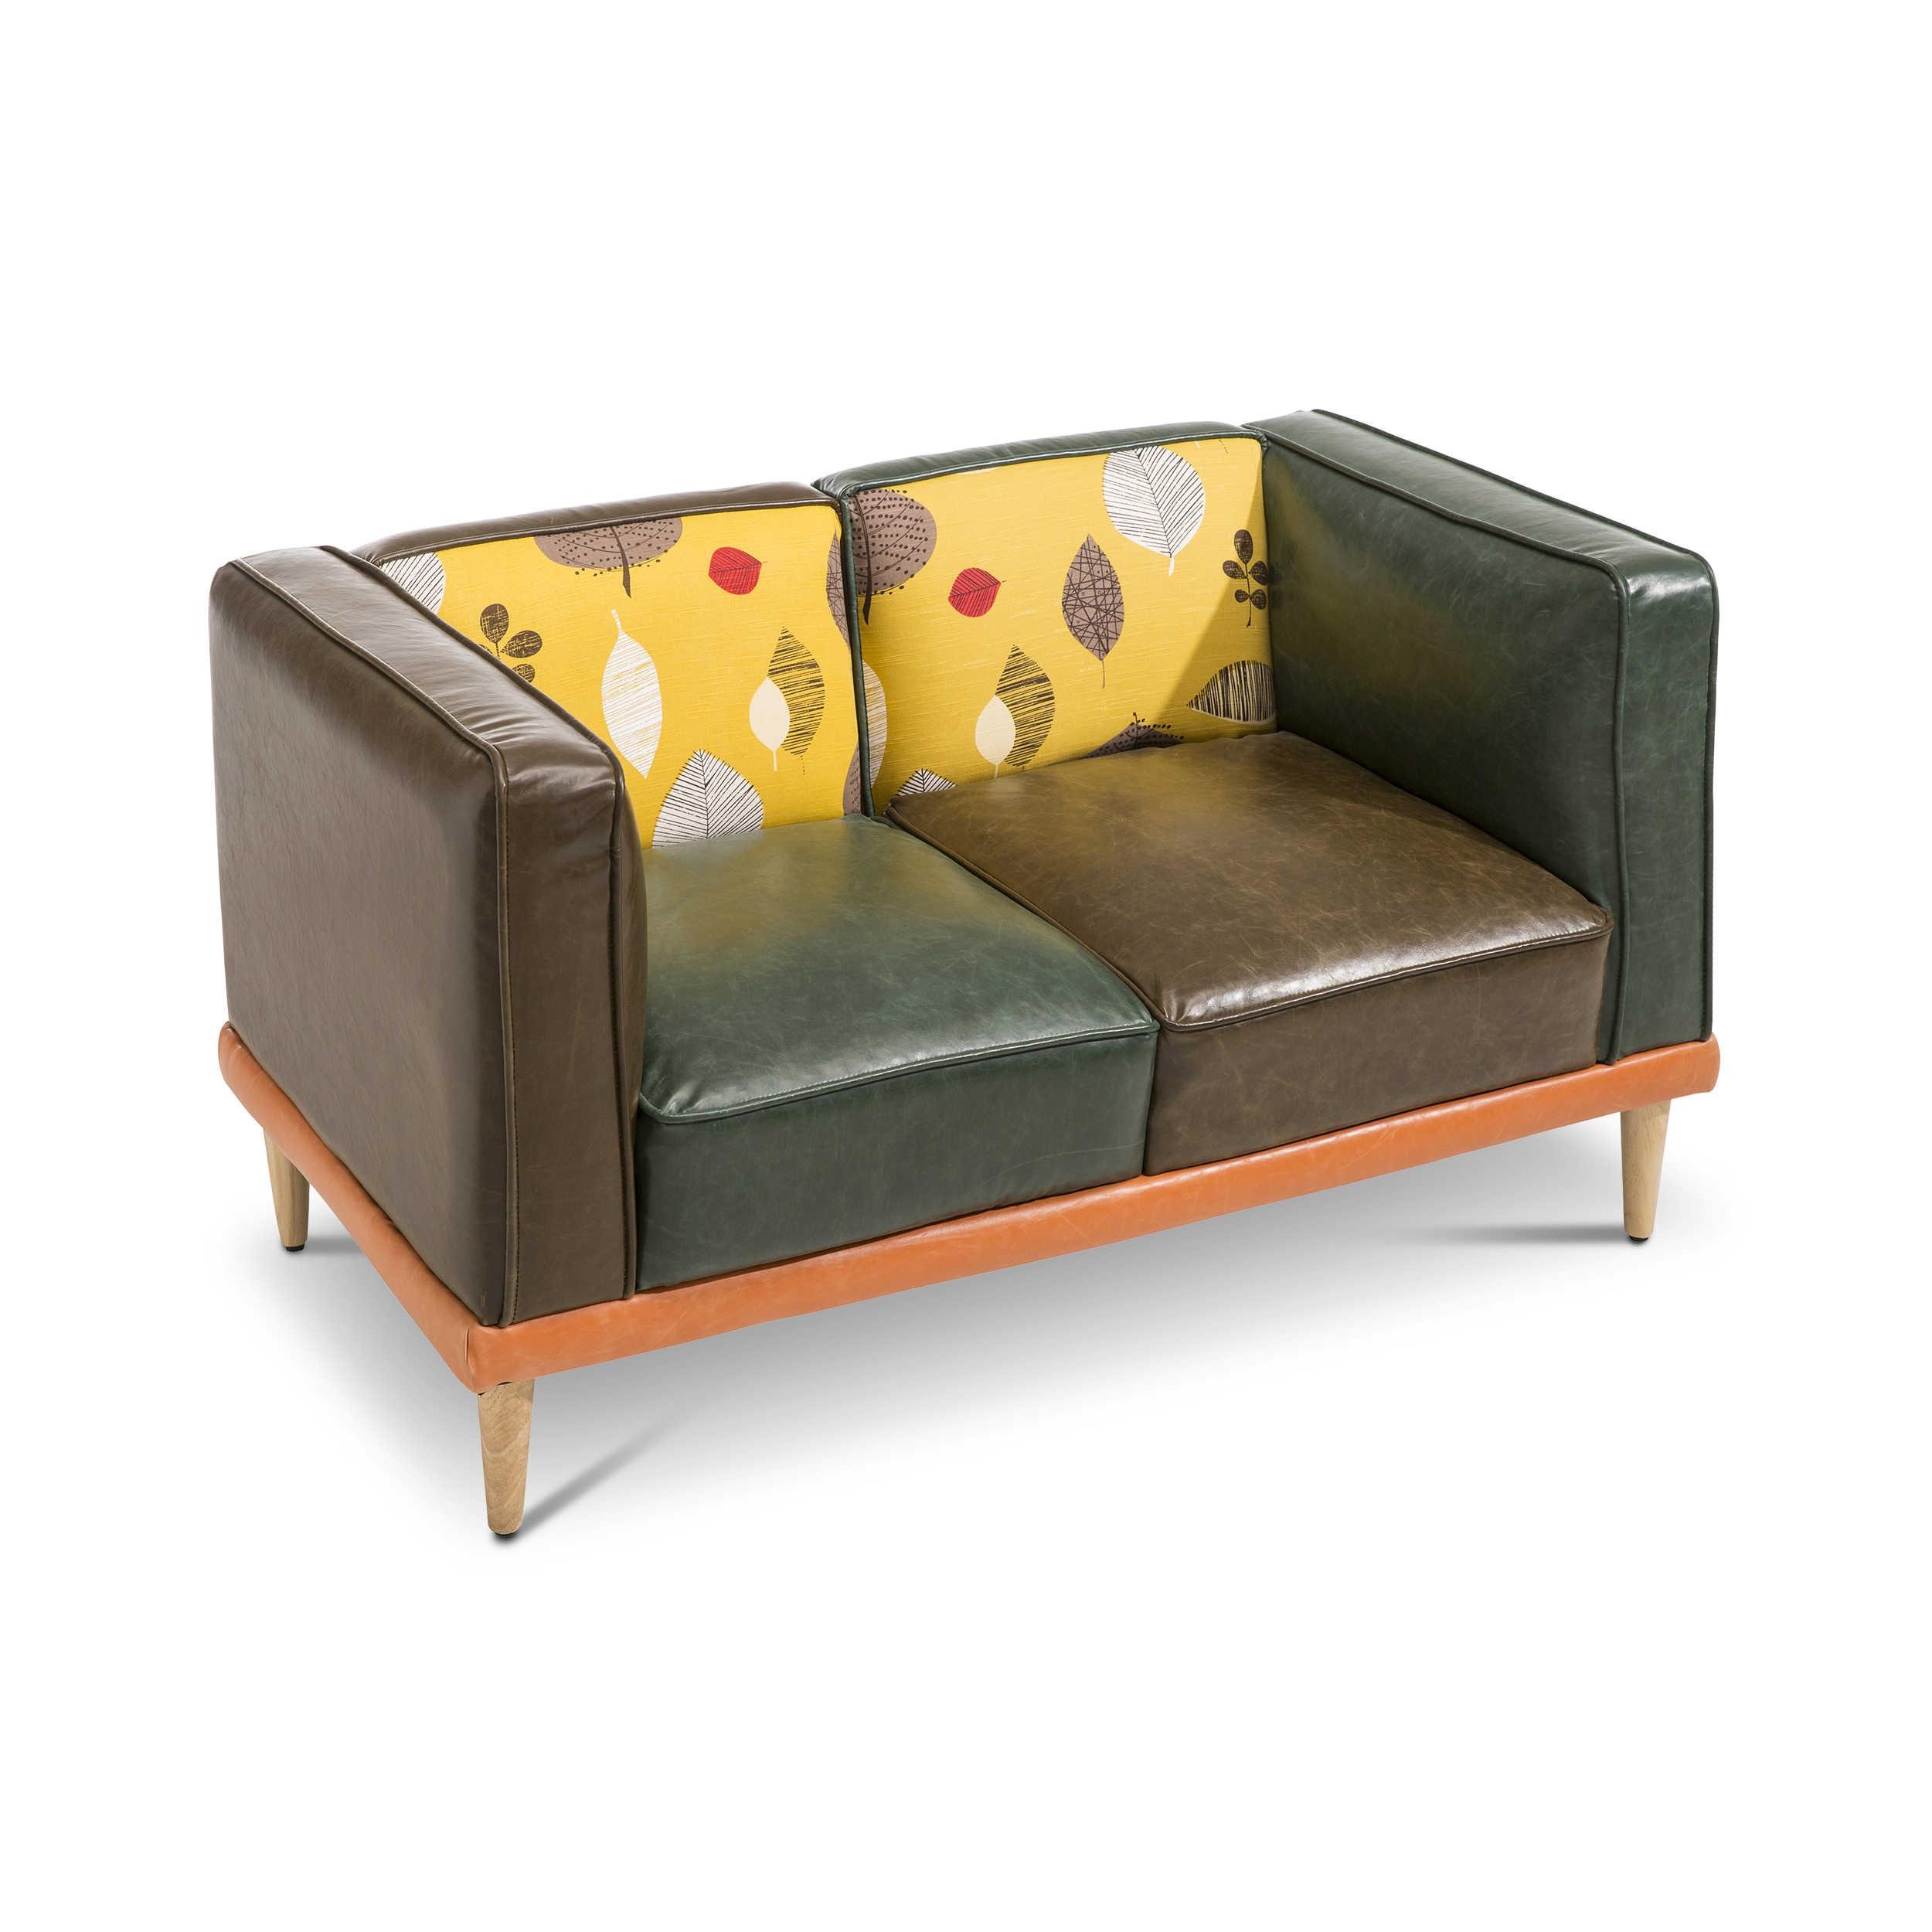 Full Size of Kare Sofa Couch Leder Furniture List Sale Proud Bed Infinity Sales Design Gianni Leaf Braun Lederoptik Online Kaufen Bei Woonio Wildleder Aus Matratzen Polster Sofa Kare Sofa